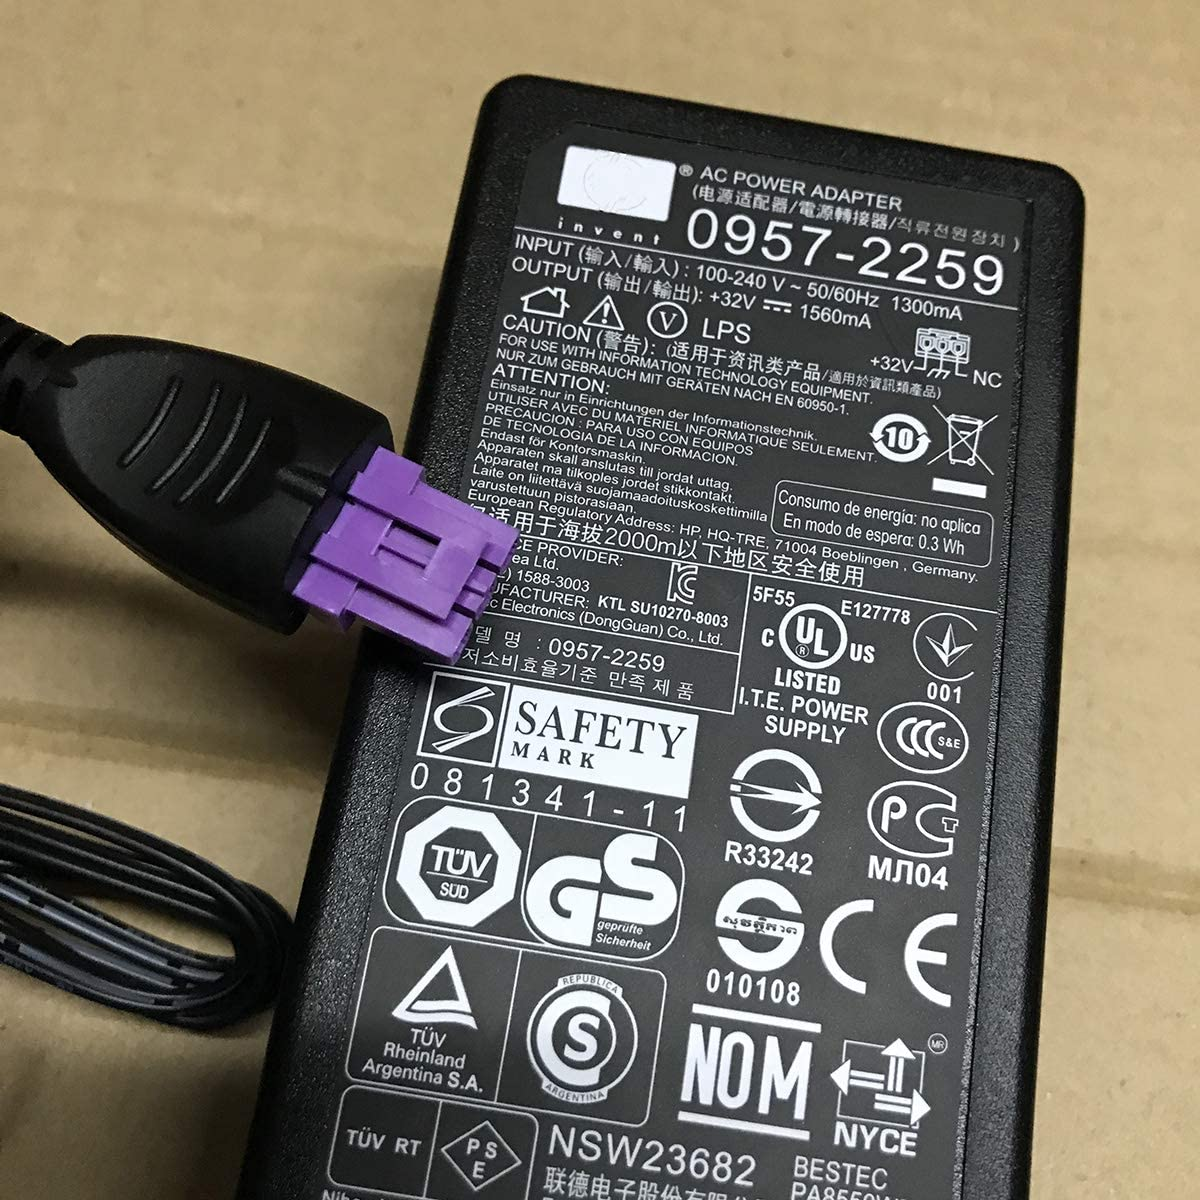 Original Printer Adapter For HP PhotoSmart 8450, HP B210, C309 a, g, C310, C2780 Printer Power Supply Charger 0957-2230 0957-2105 0957-2271